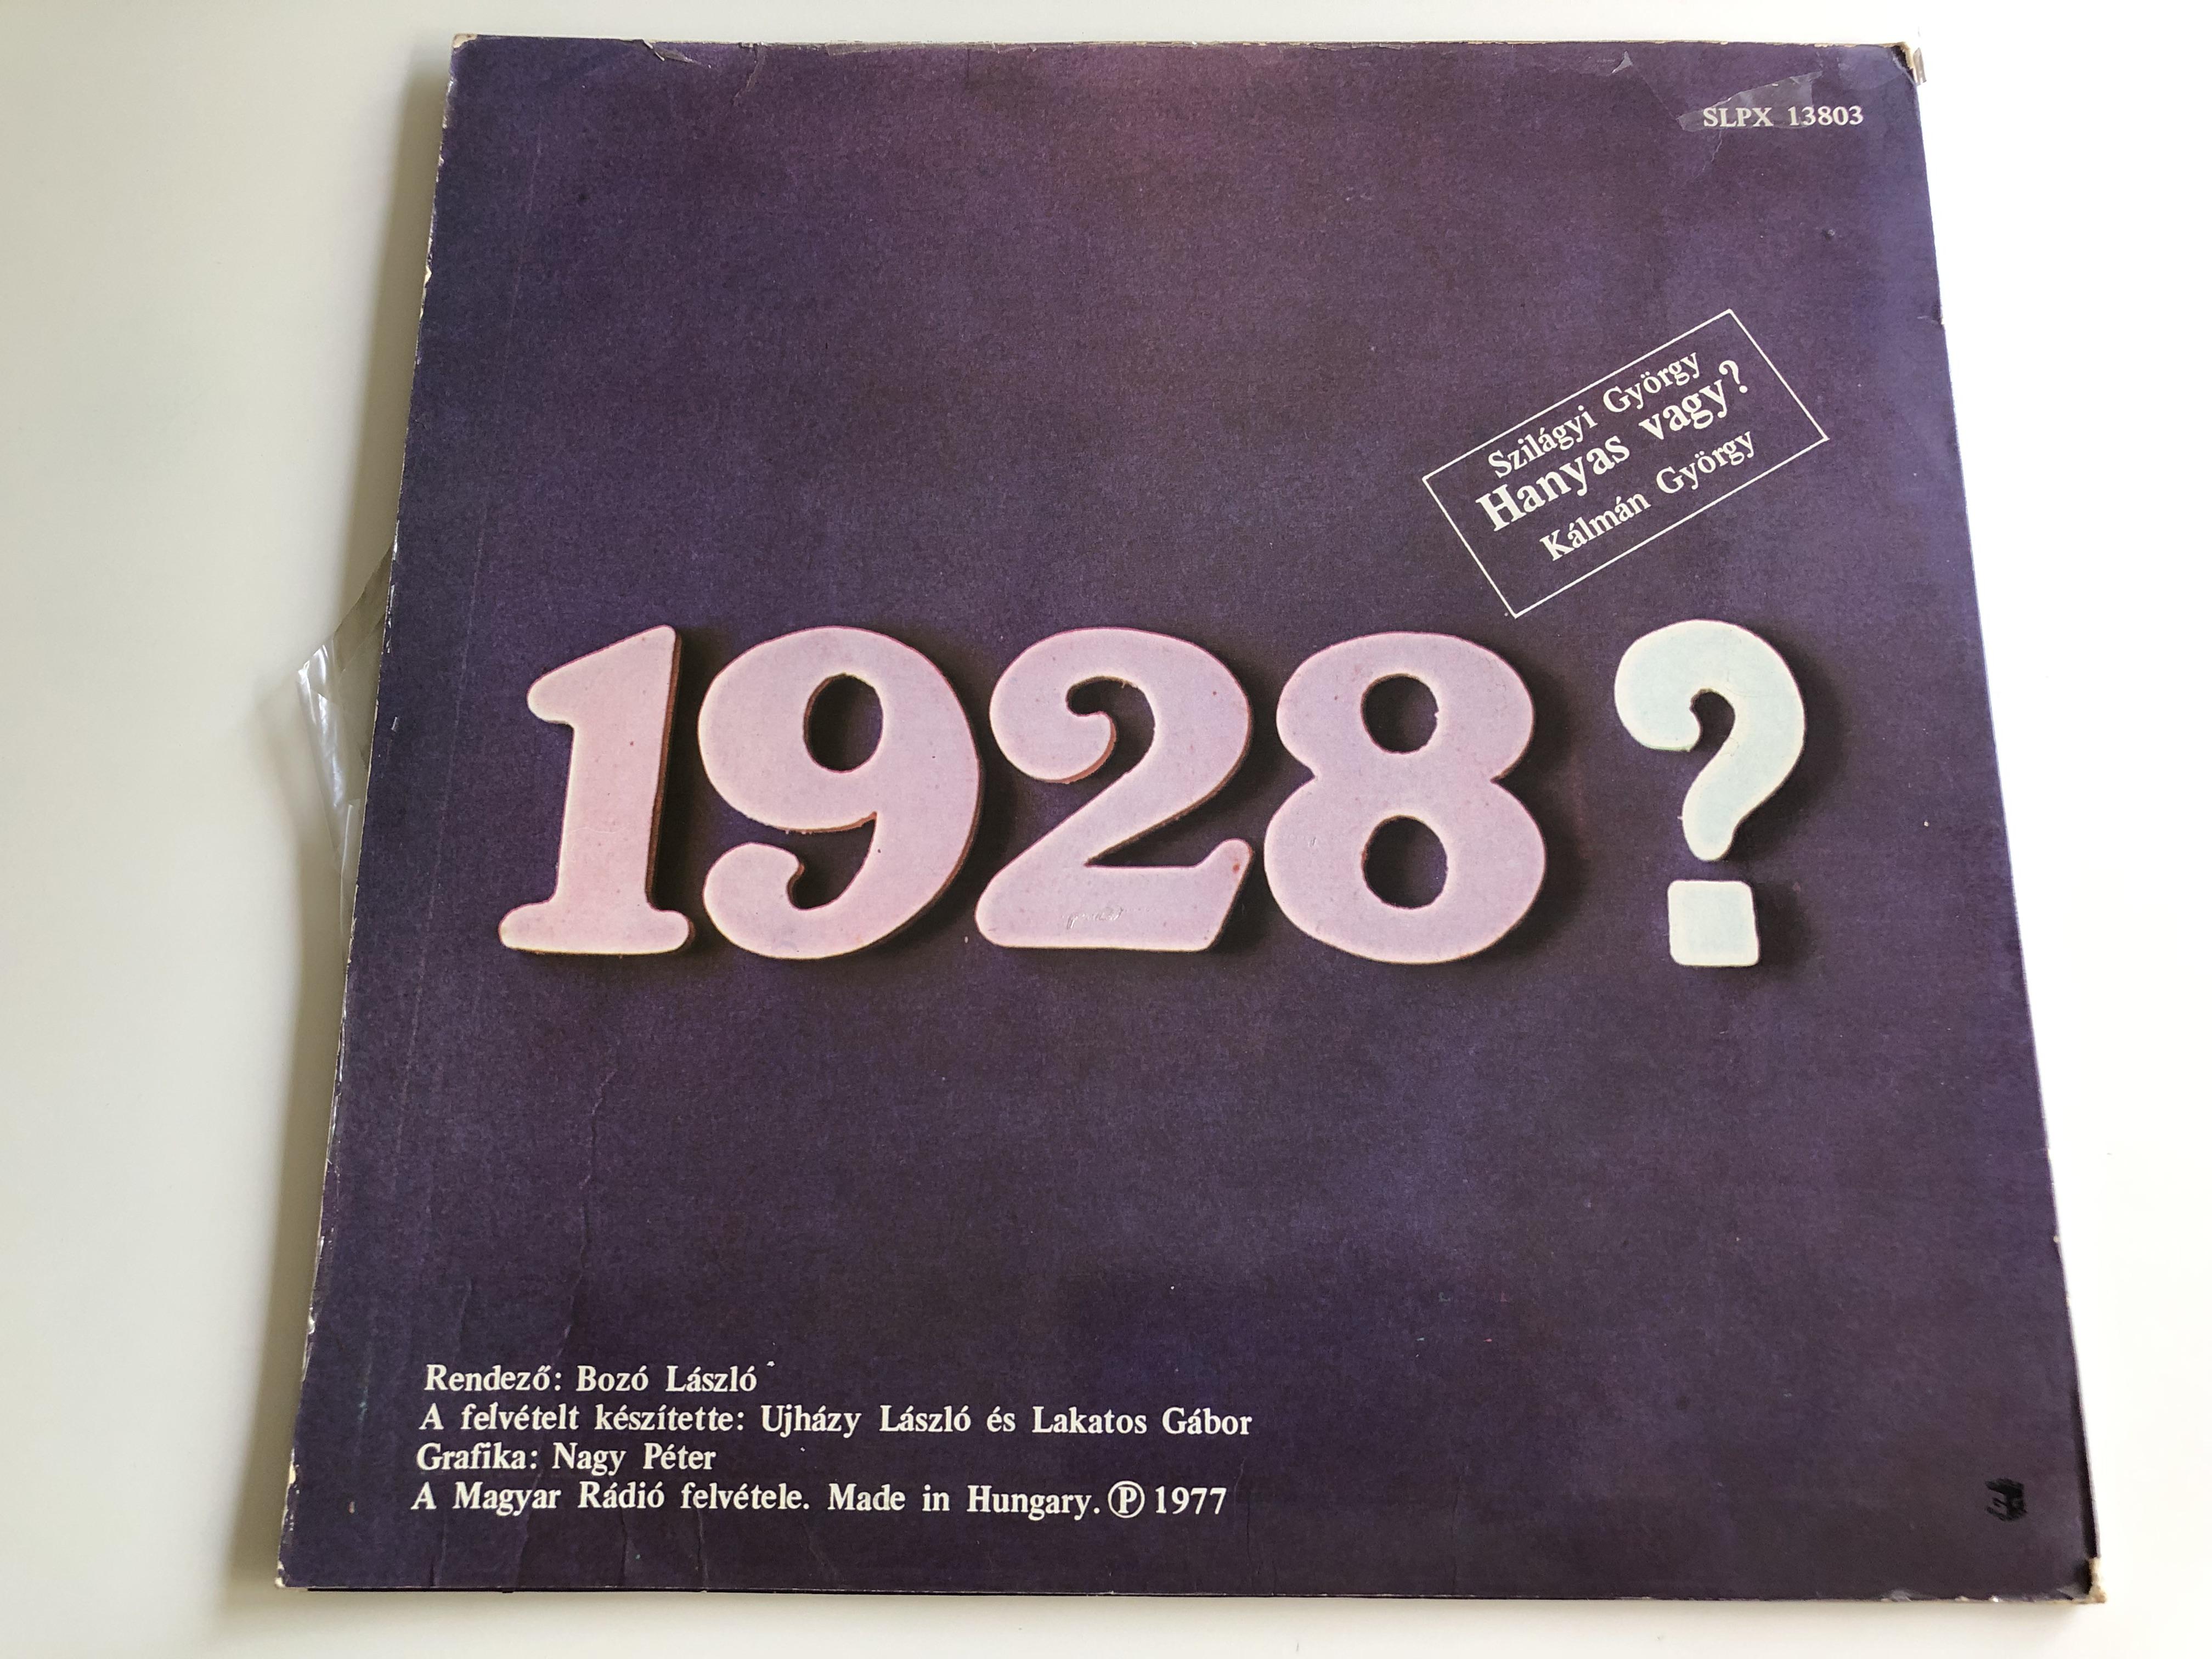 szil-gyi-gy-rgy-hanyas-vagy-1928-k-lm-n-gy-rgy-directed-by-boz-l-szl-hungarian-radio-recording-1977-slpx-13803-stereo-mono-2-.jpg